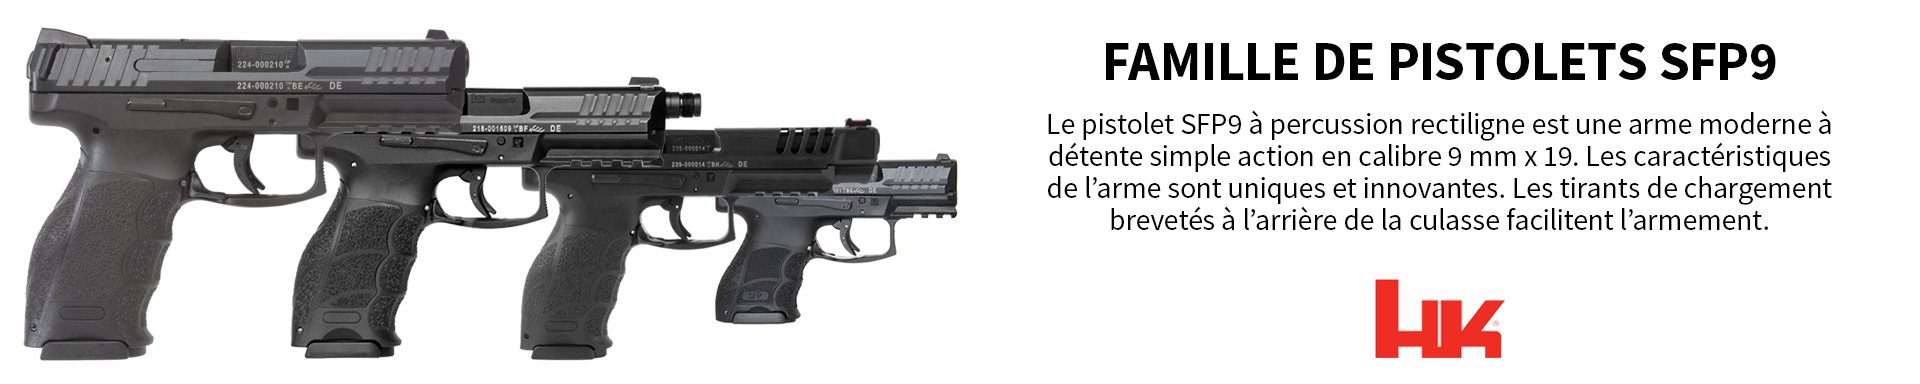 HK - SFP9